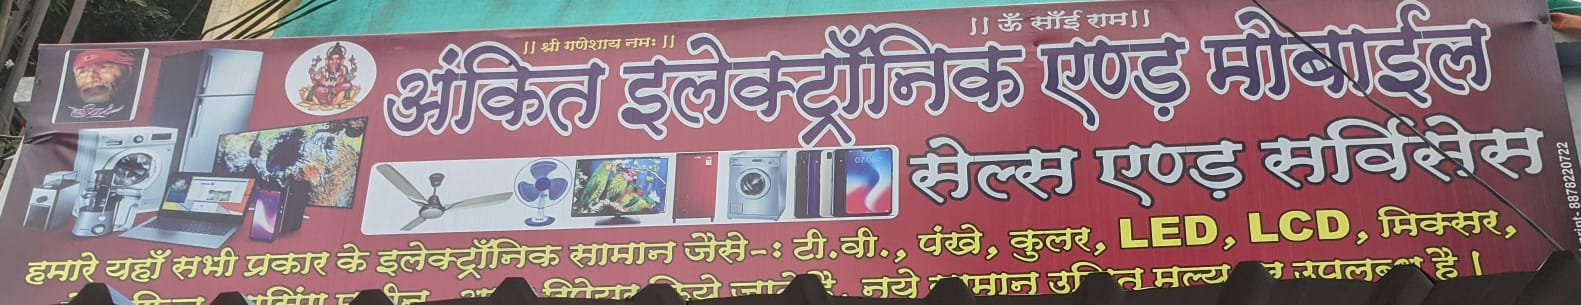 Ankit electronic & mobile